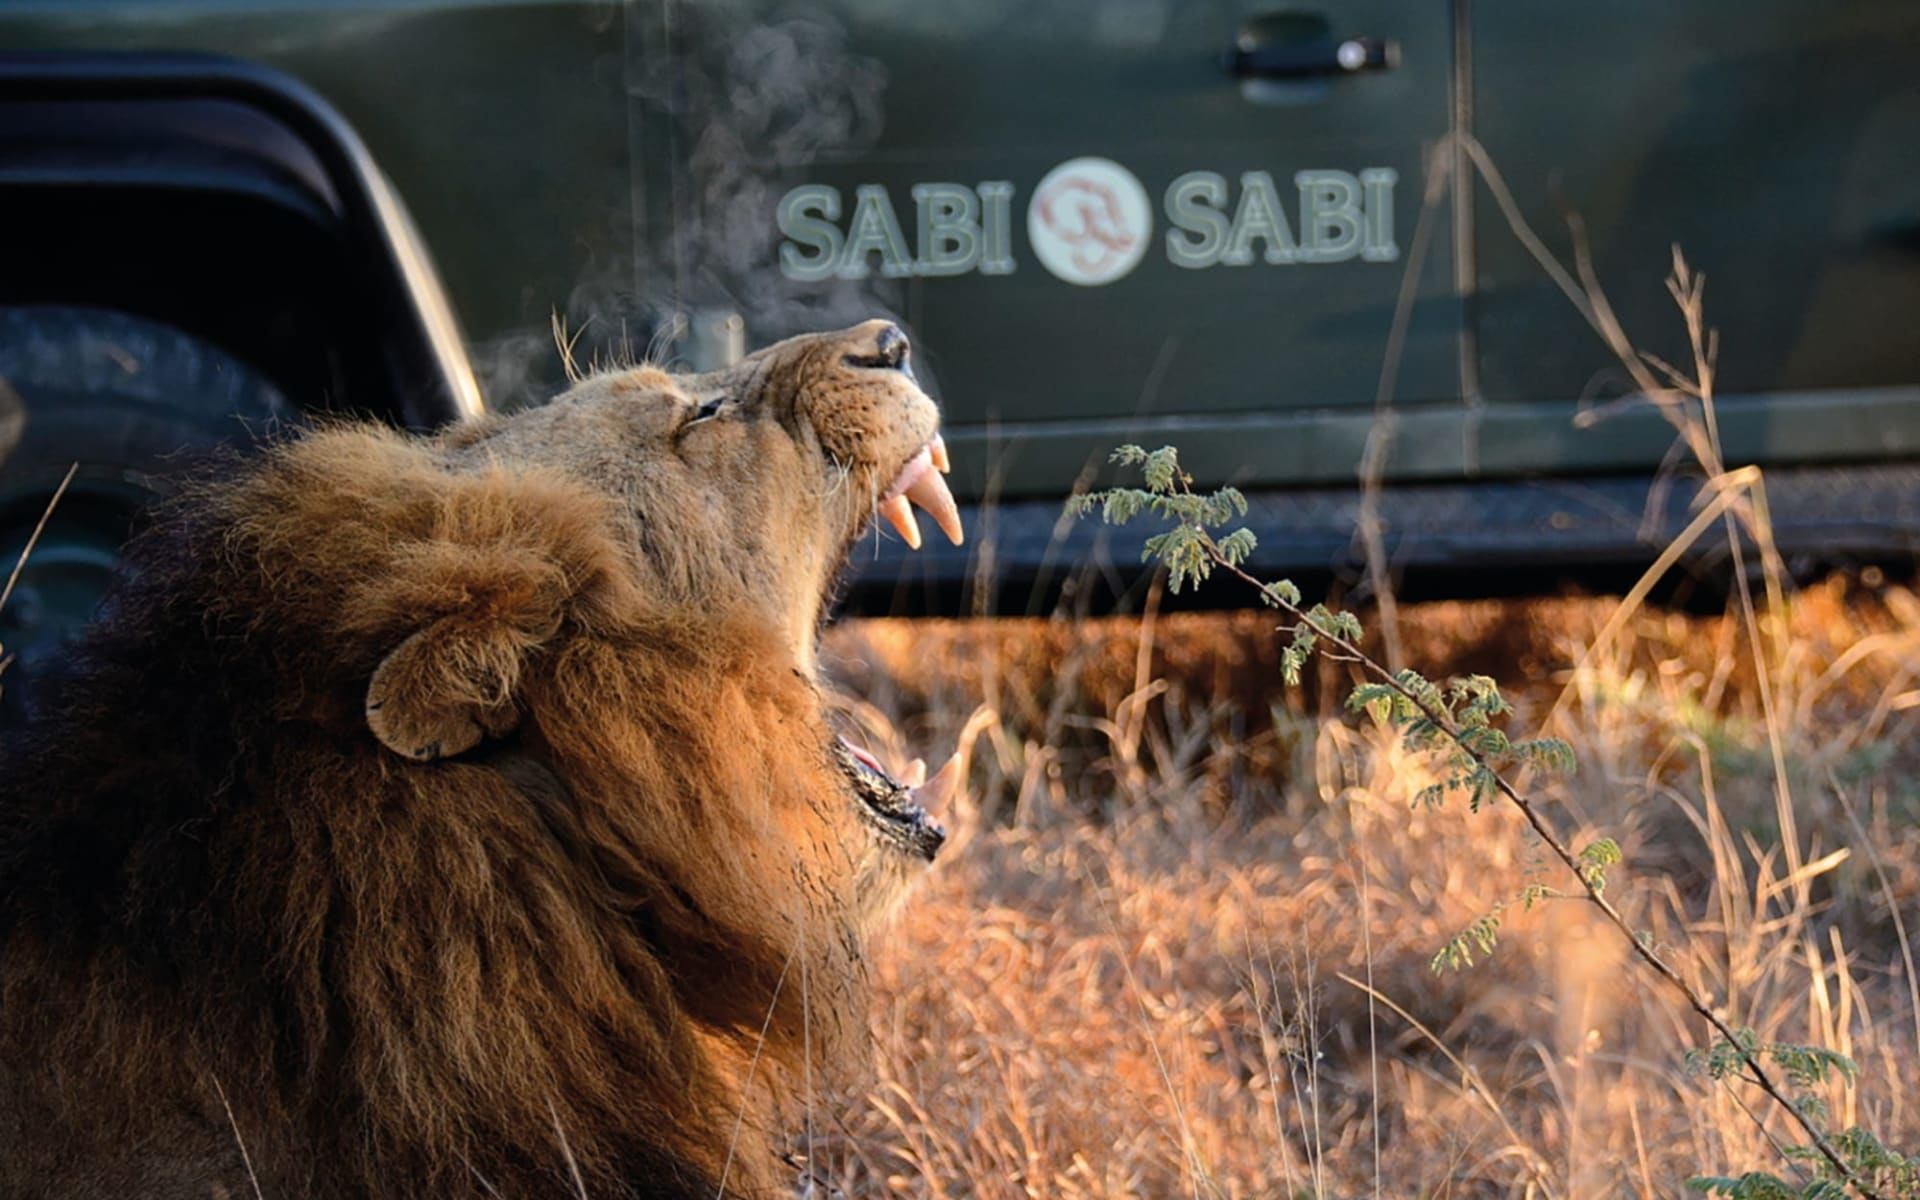 South Africa's Secrets ab Kapstadt: activities: Sabi Sabi - Safarifahrzeug und bruellender Loewe